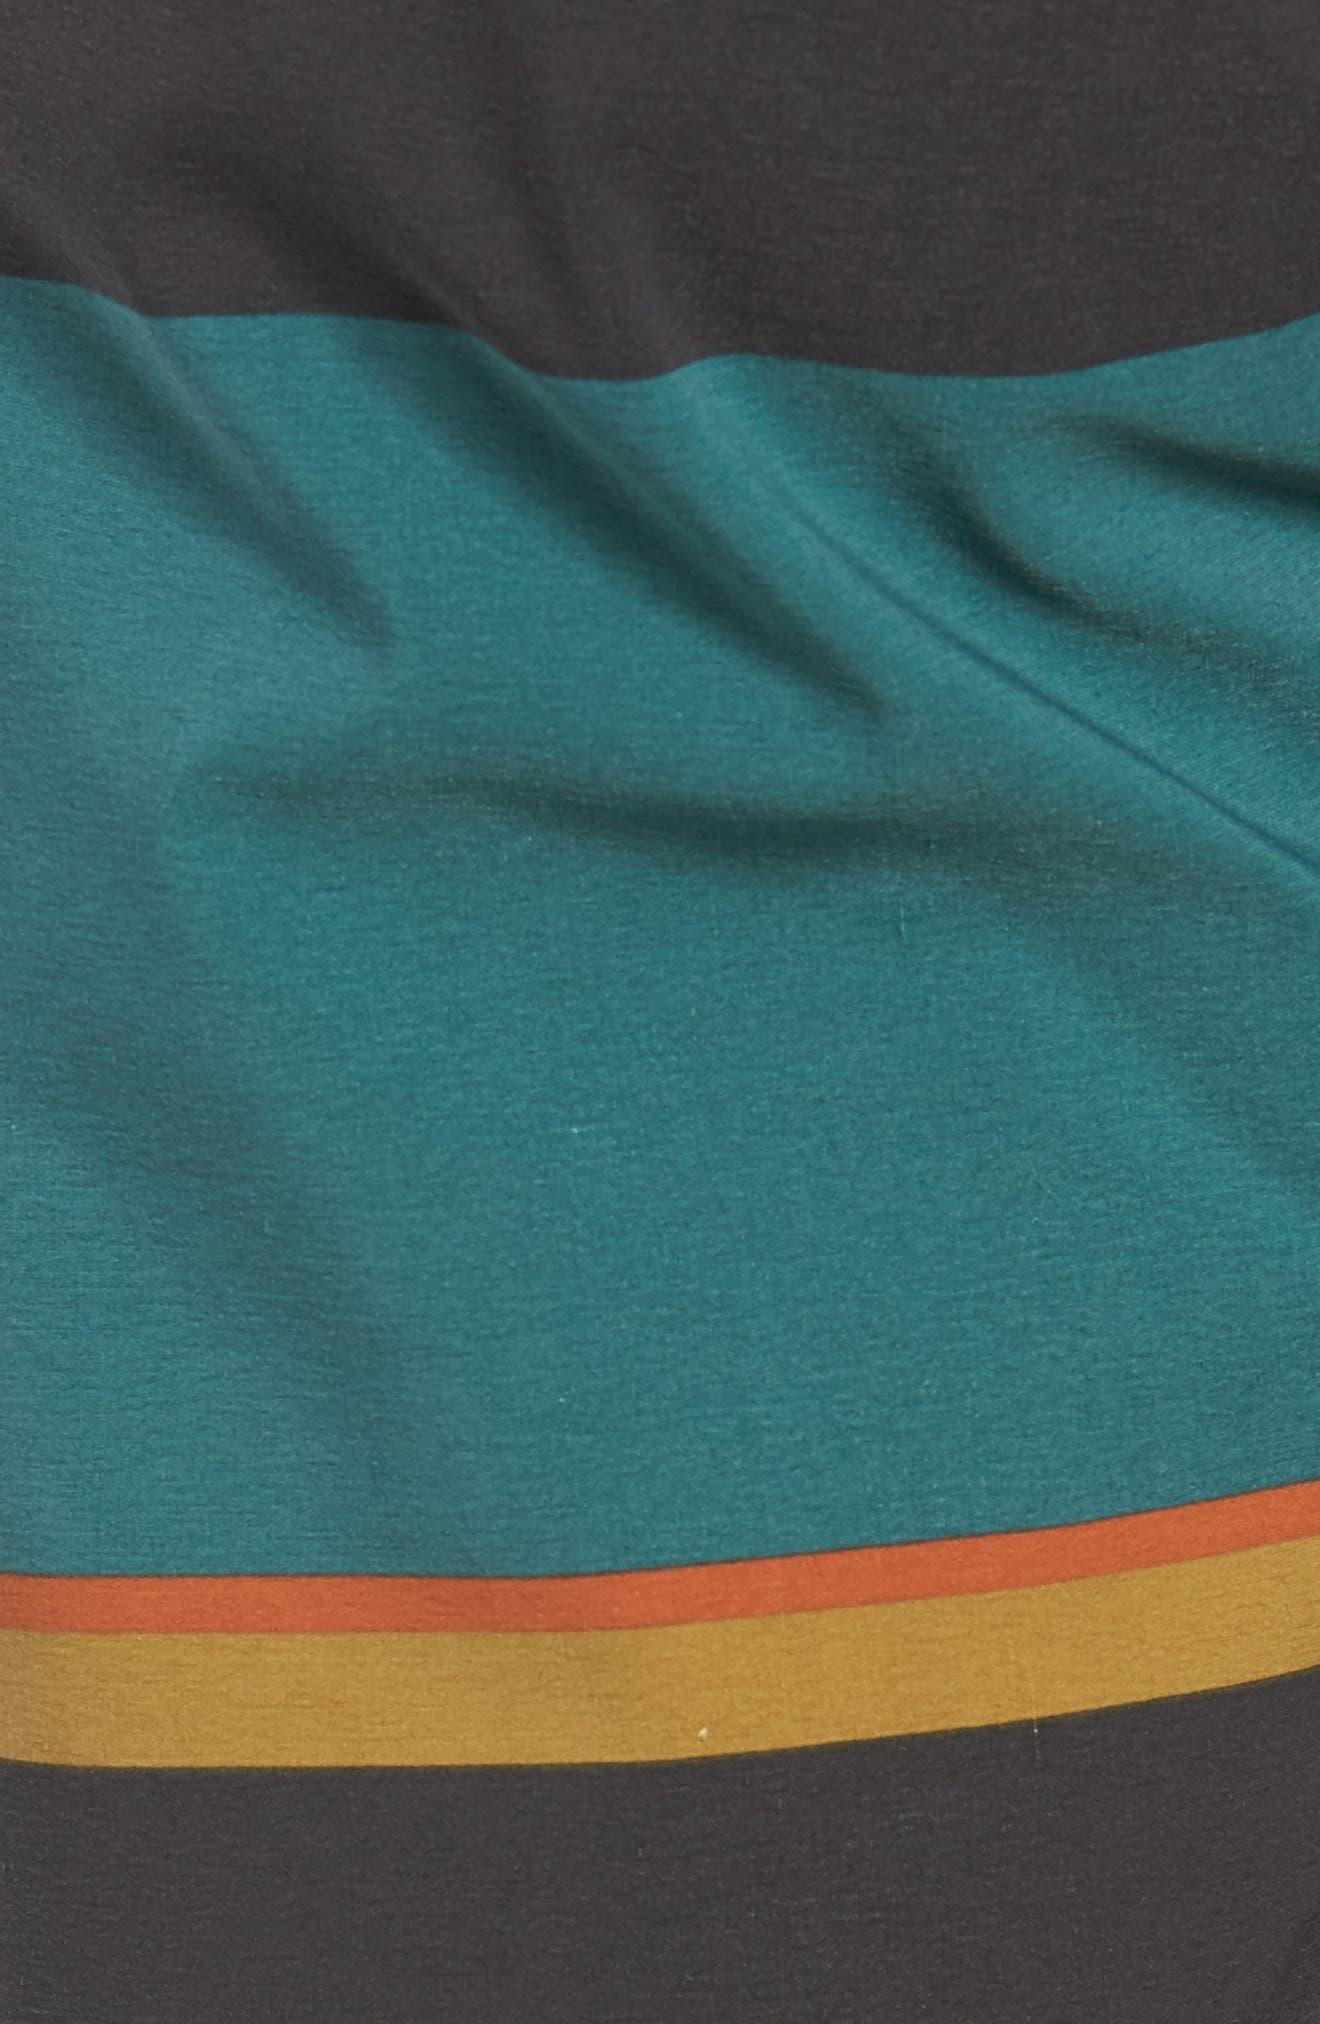 VOLCOM,                             3 Quarta Stoney Board Shorts,                             Alternate thumbnail 5, color,                             366